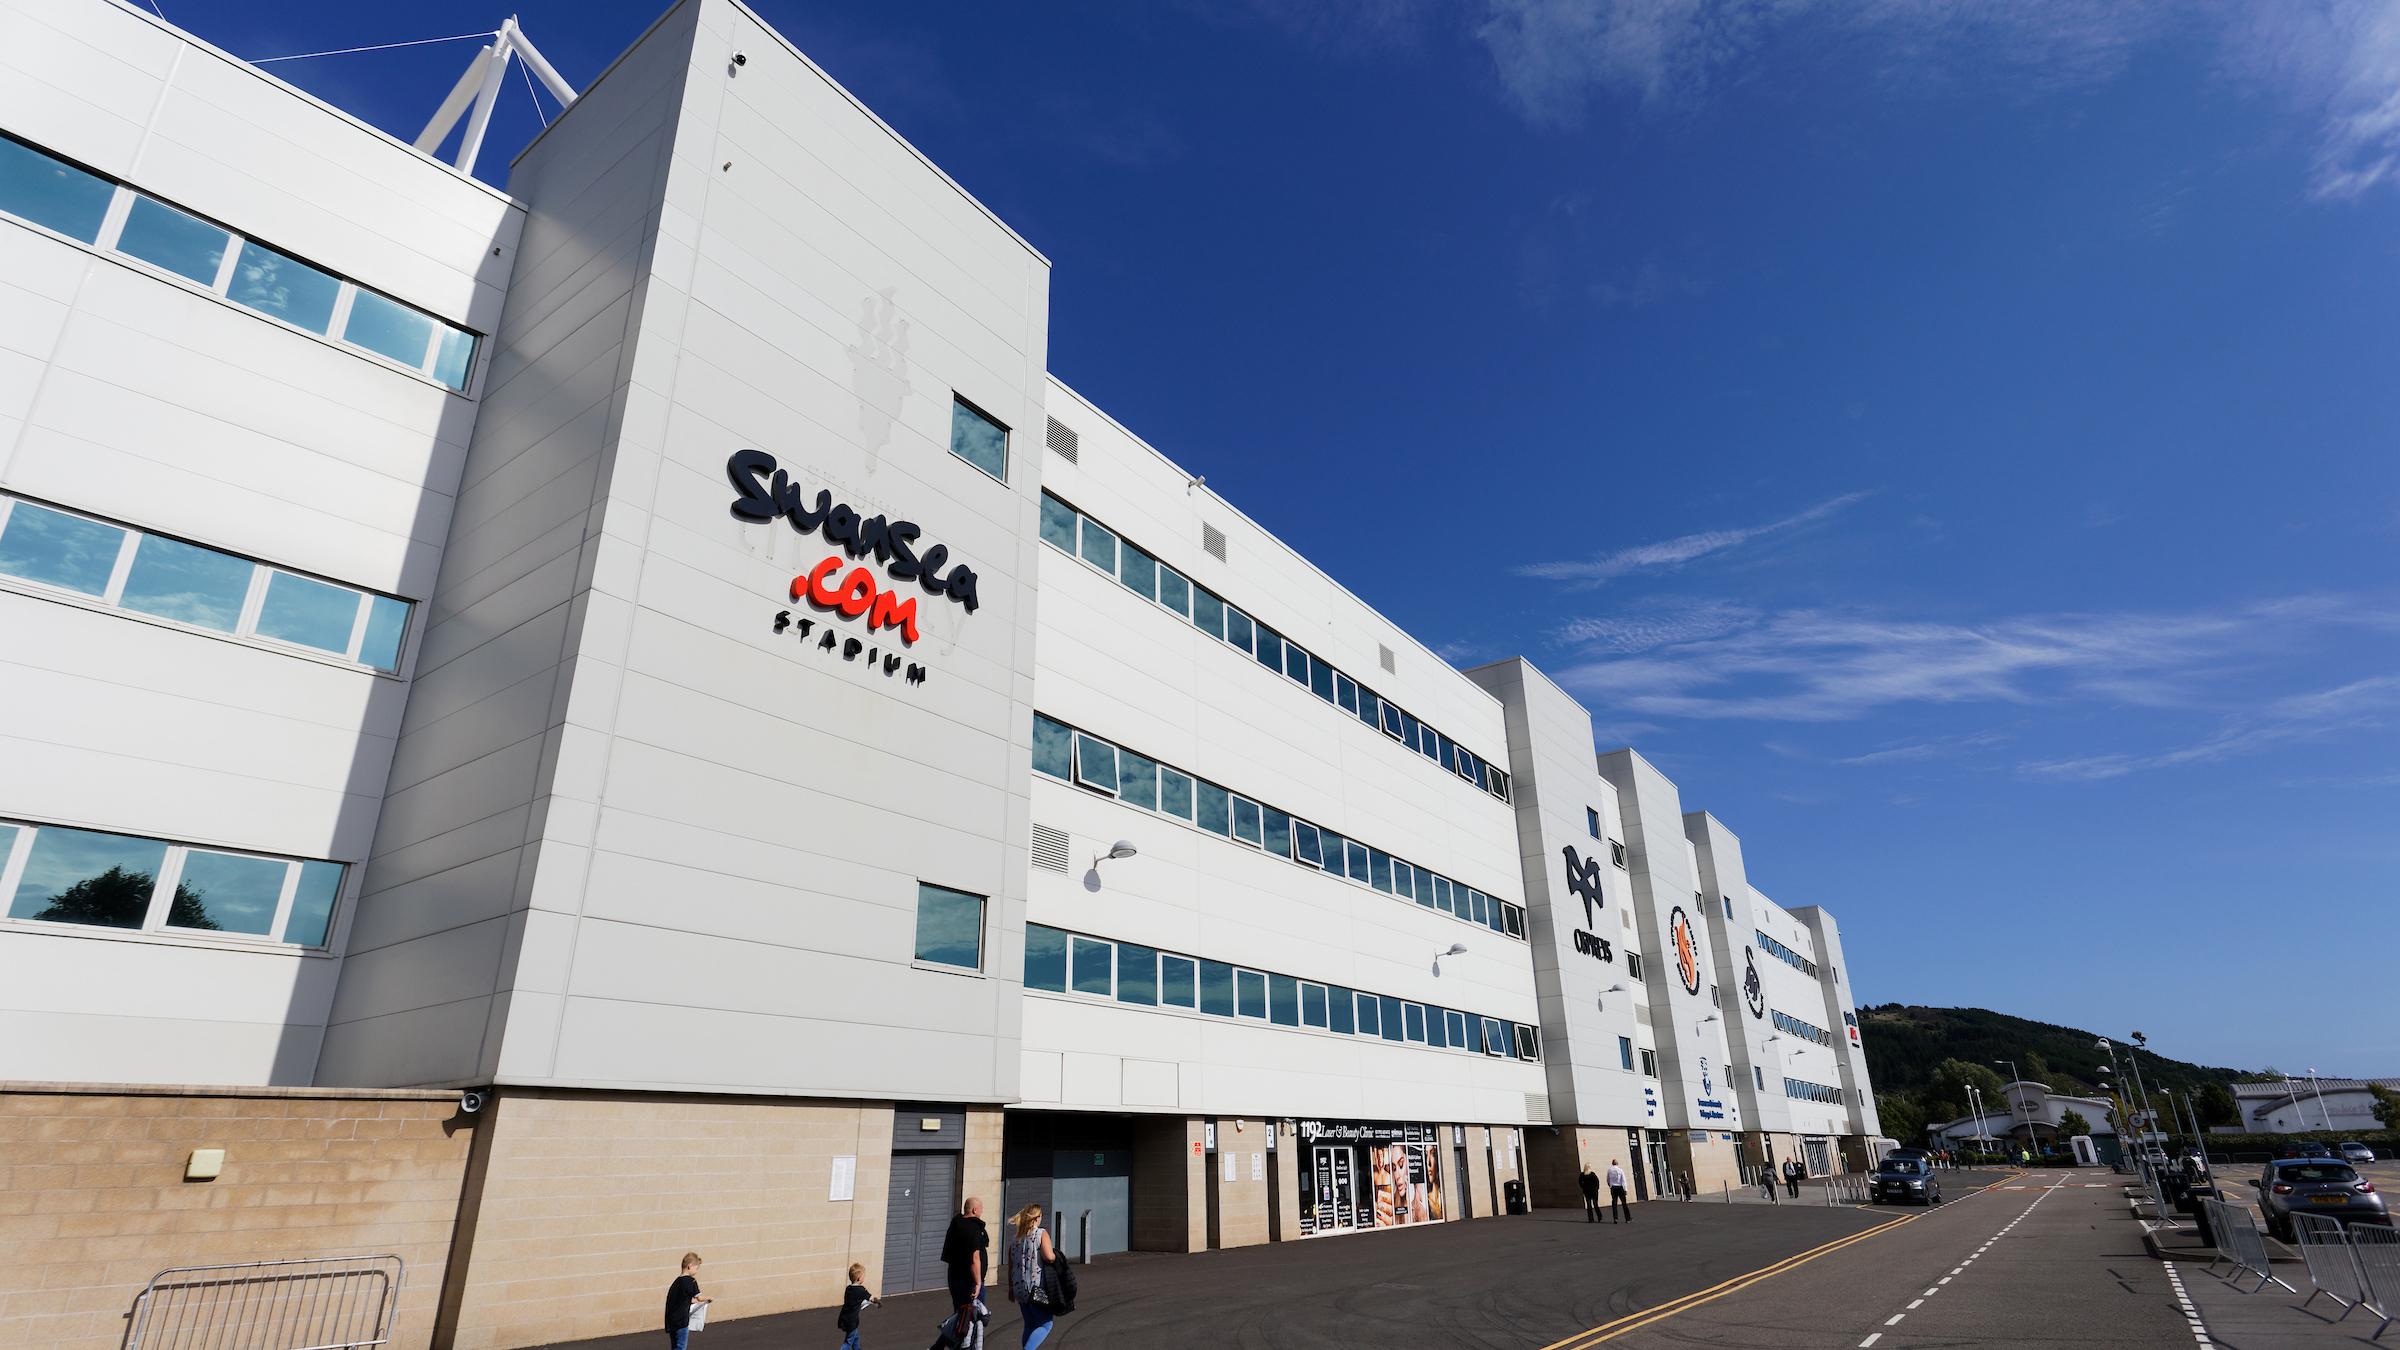 Sheffield United home stadium